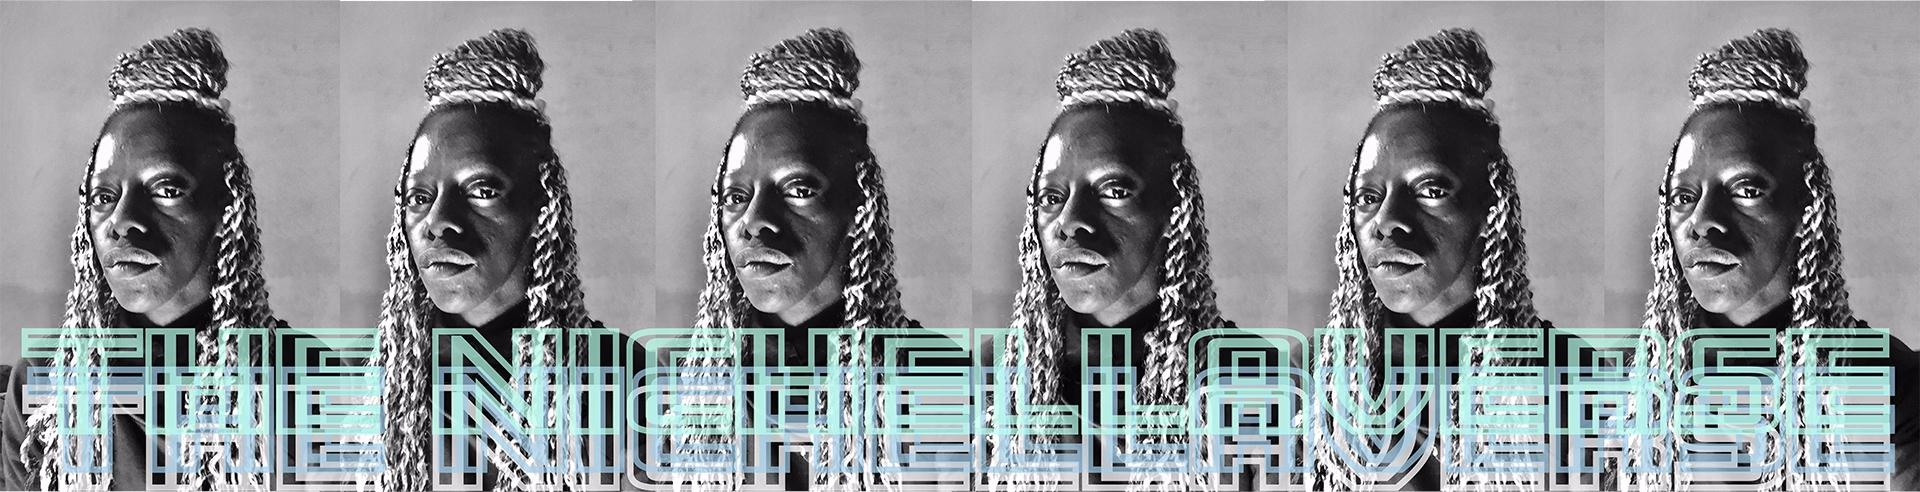 Nichelle (@nichellaverse) Cover Image